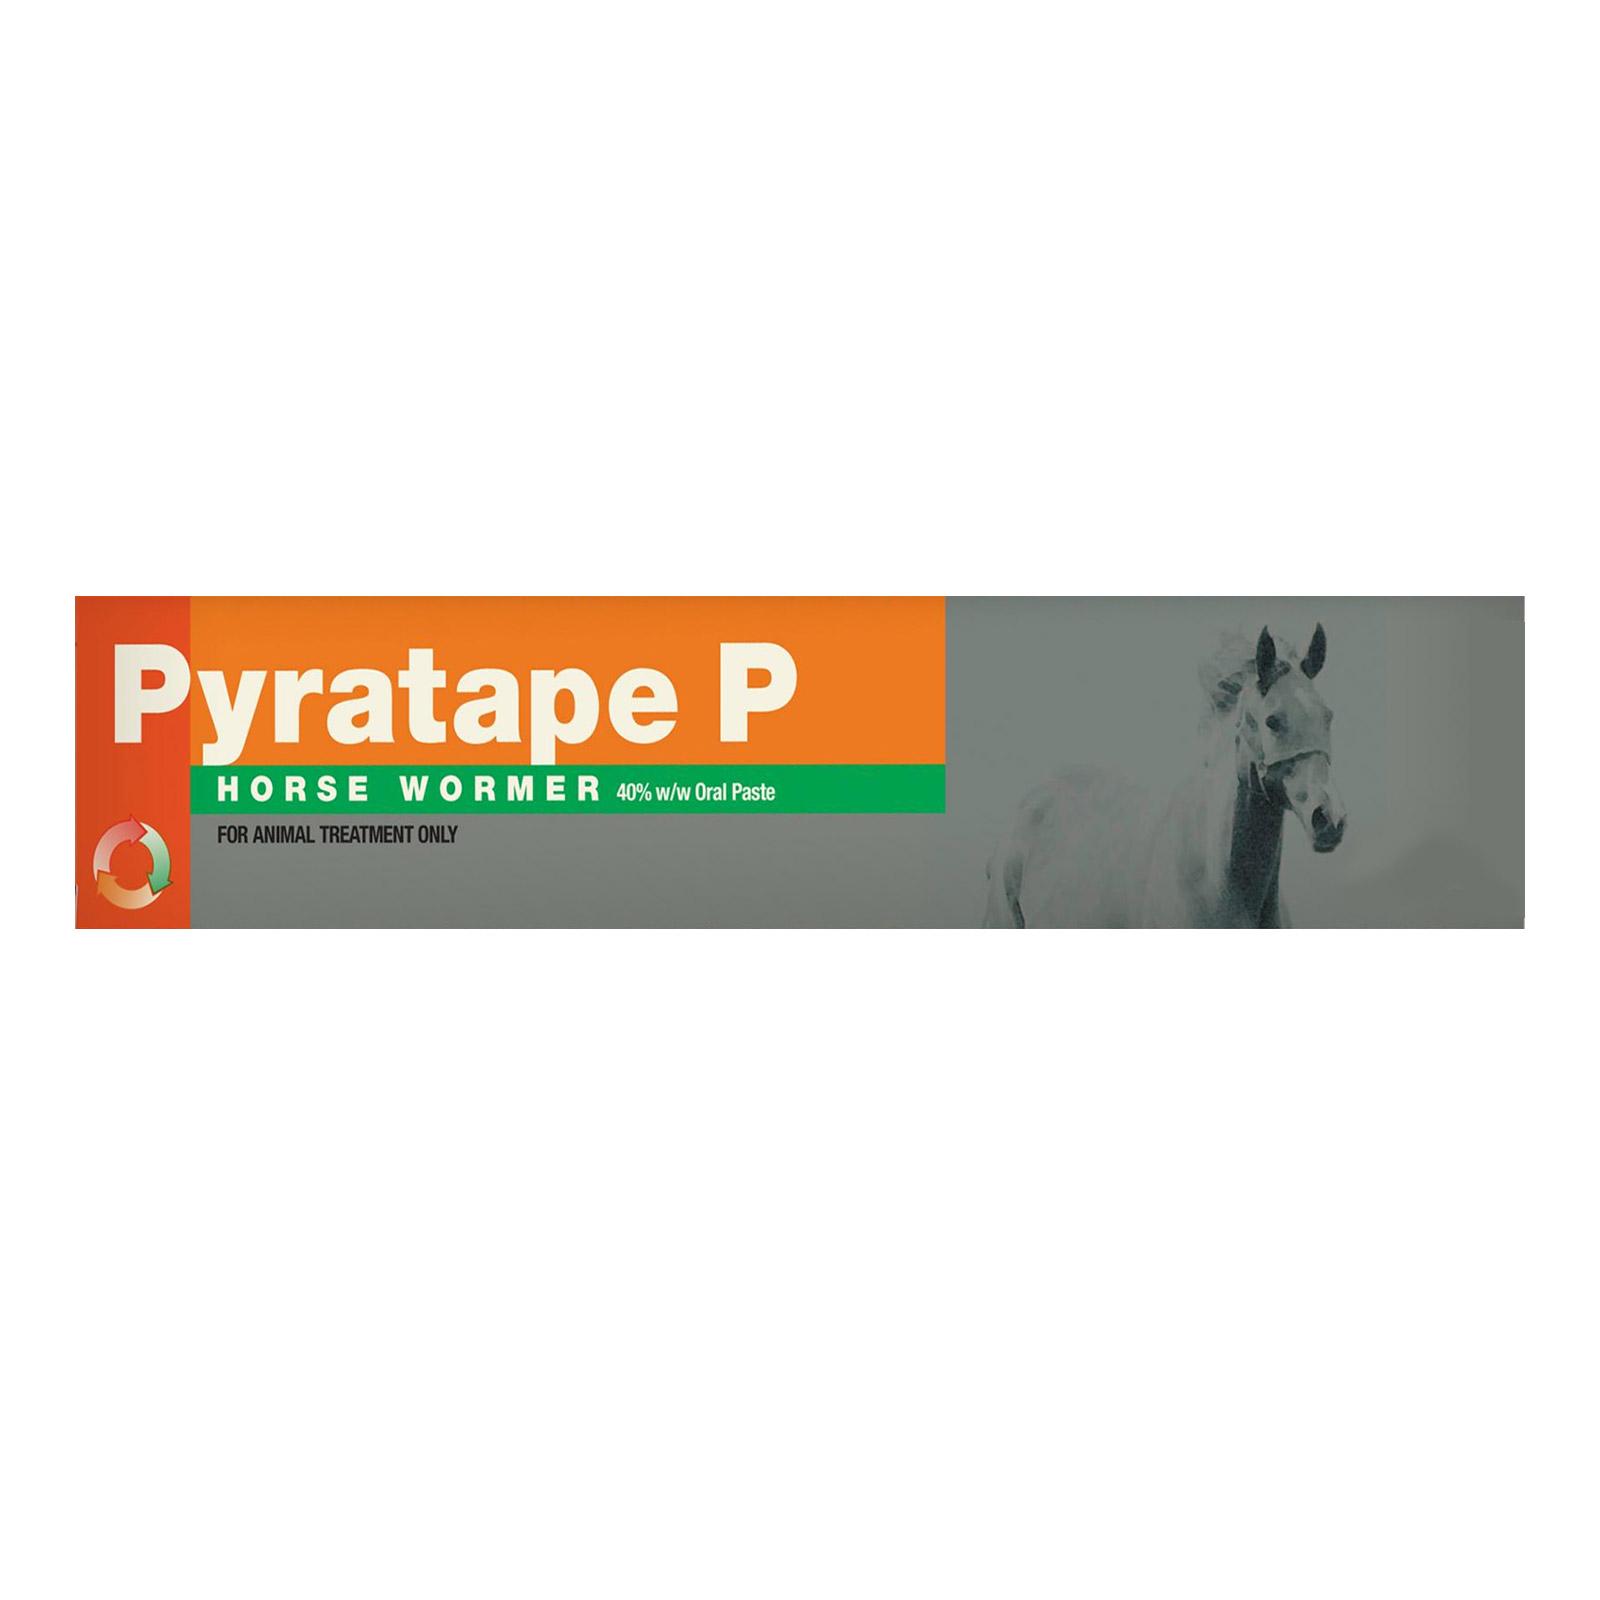 BudgetPetCare.com - Pyratape P Horse Worming Paste 28.5 Gm 1 Syringe 33.22 USD